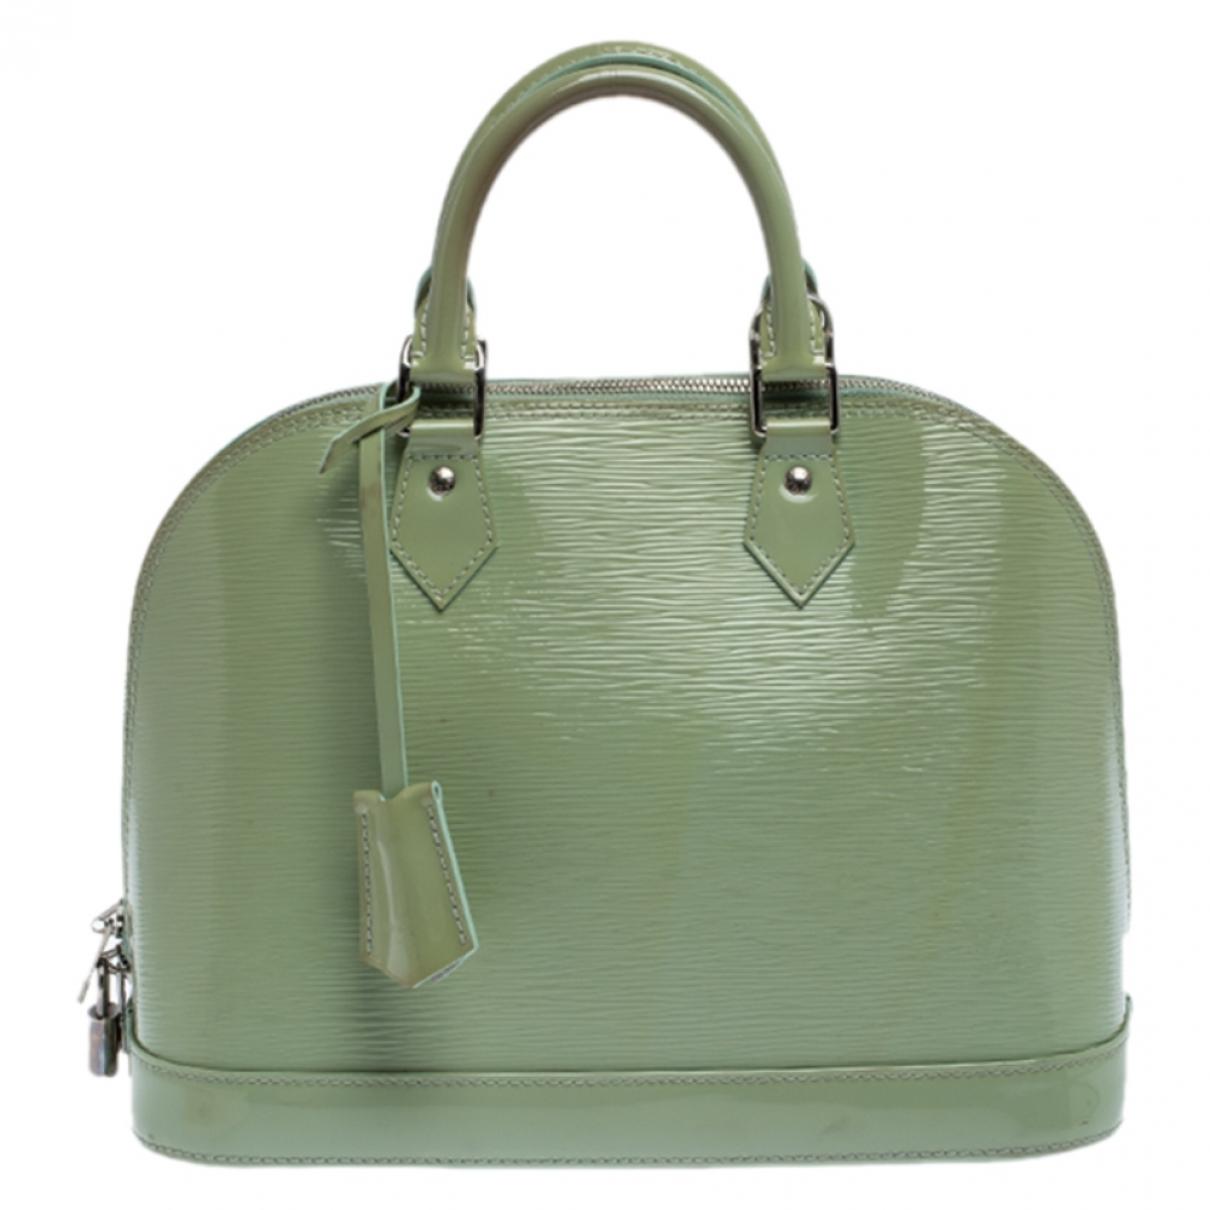 Louis Vuitton - Sac a main Alma pour femme en cuir verni - vert